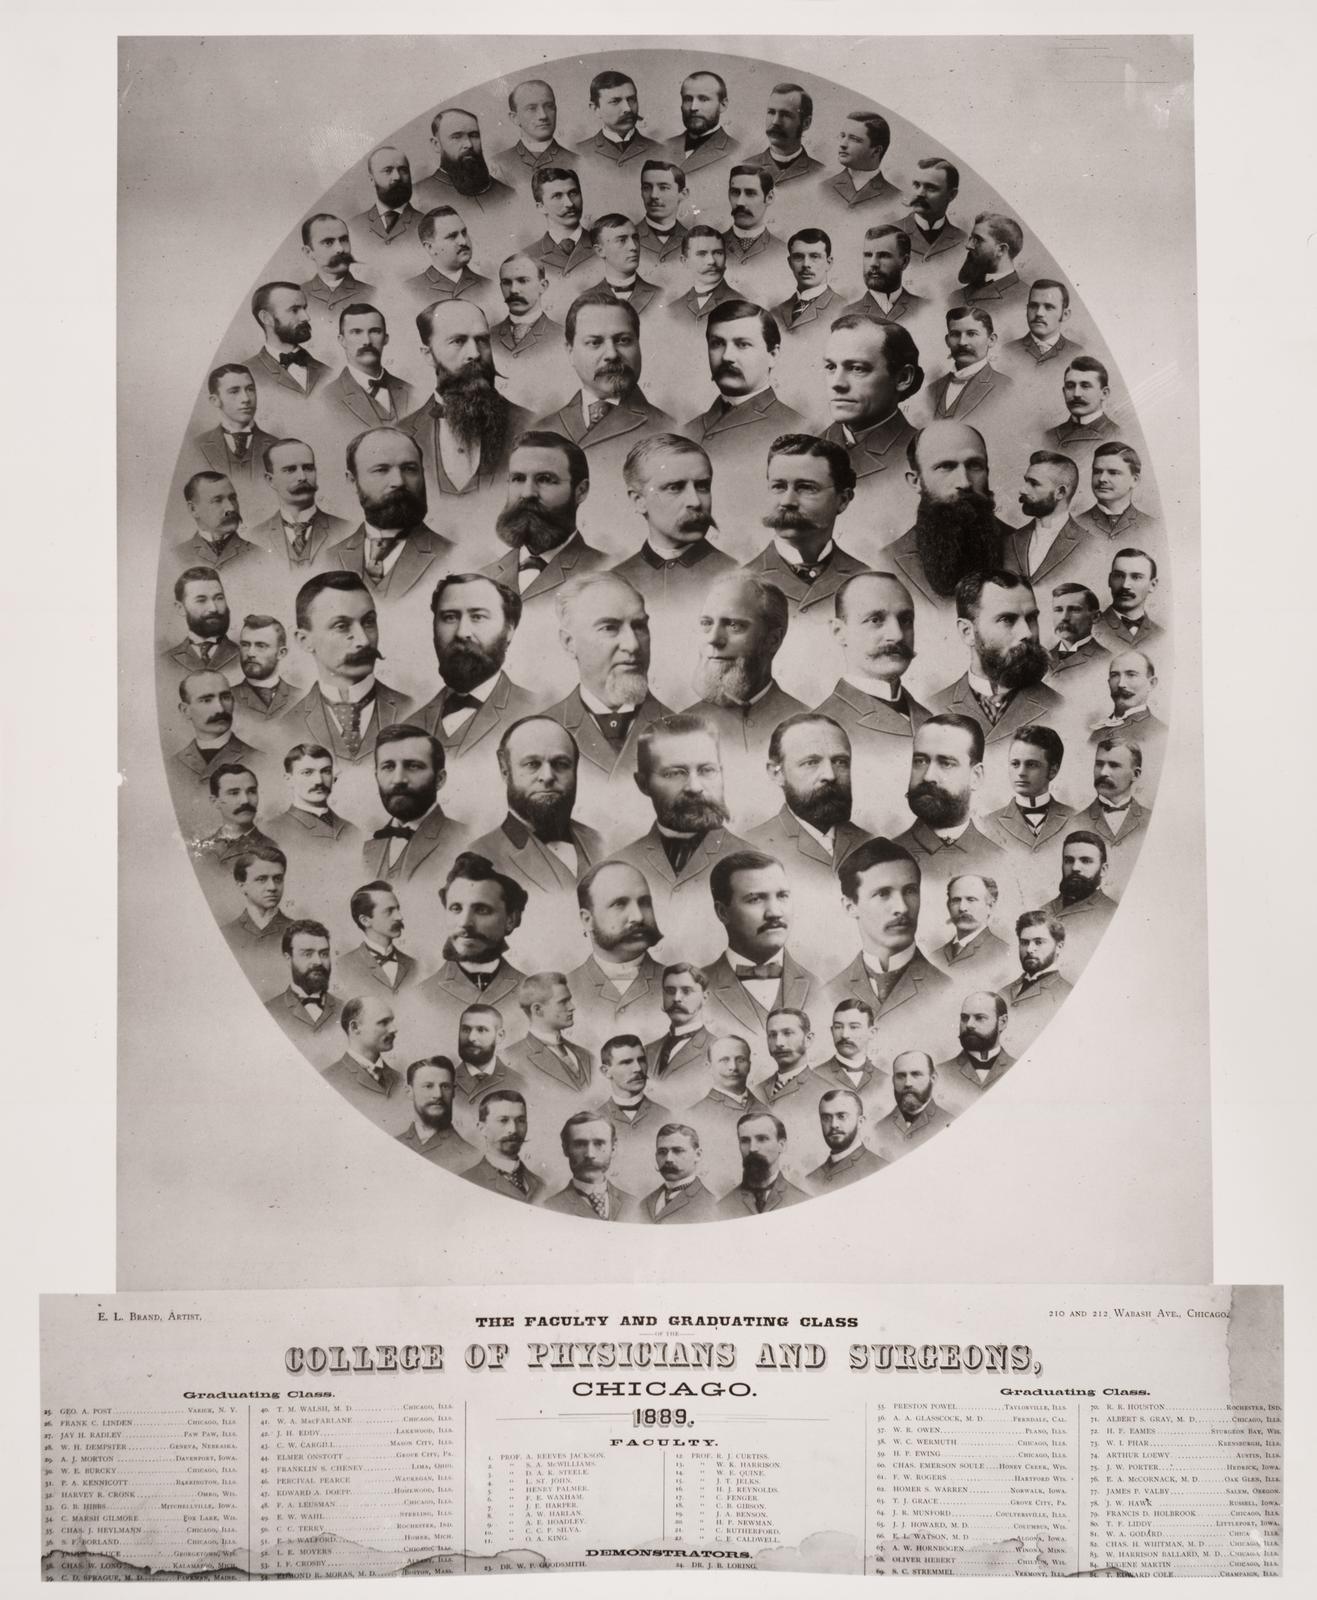 1889 graduating class, University of Illinois College of Medicine